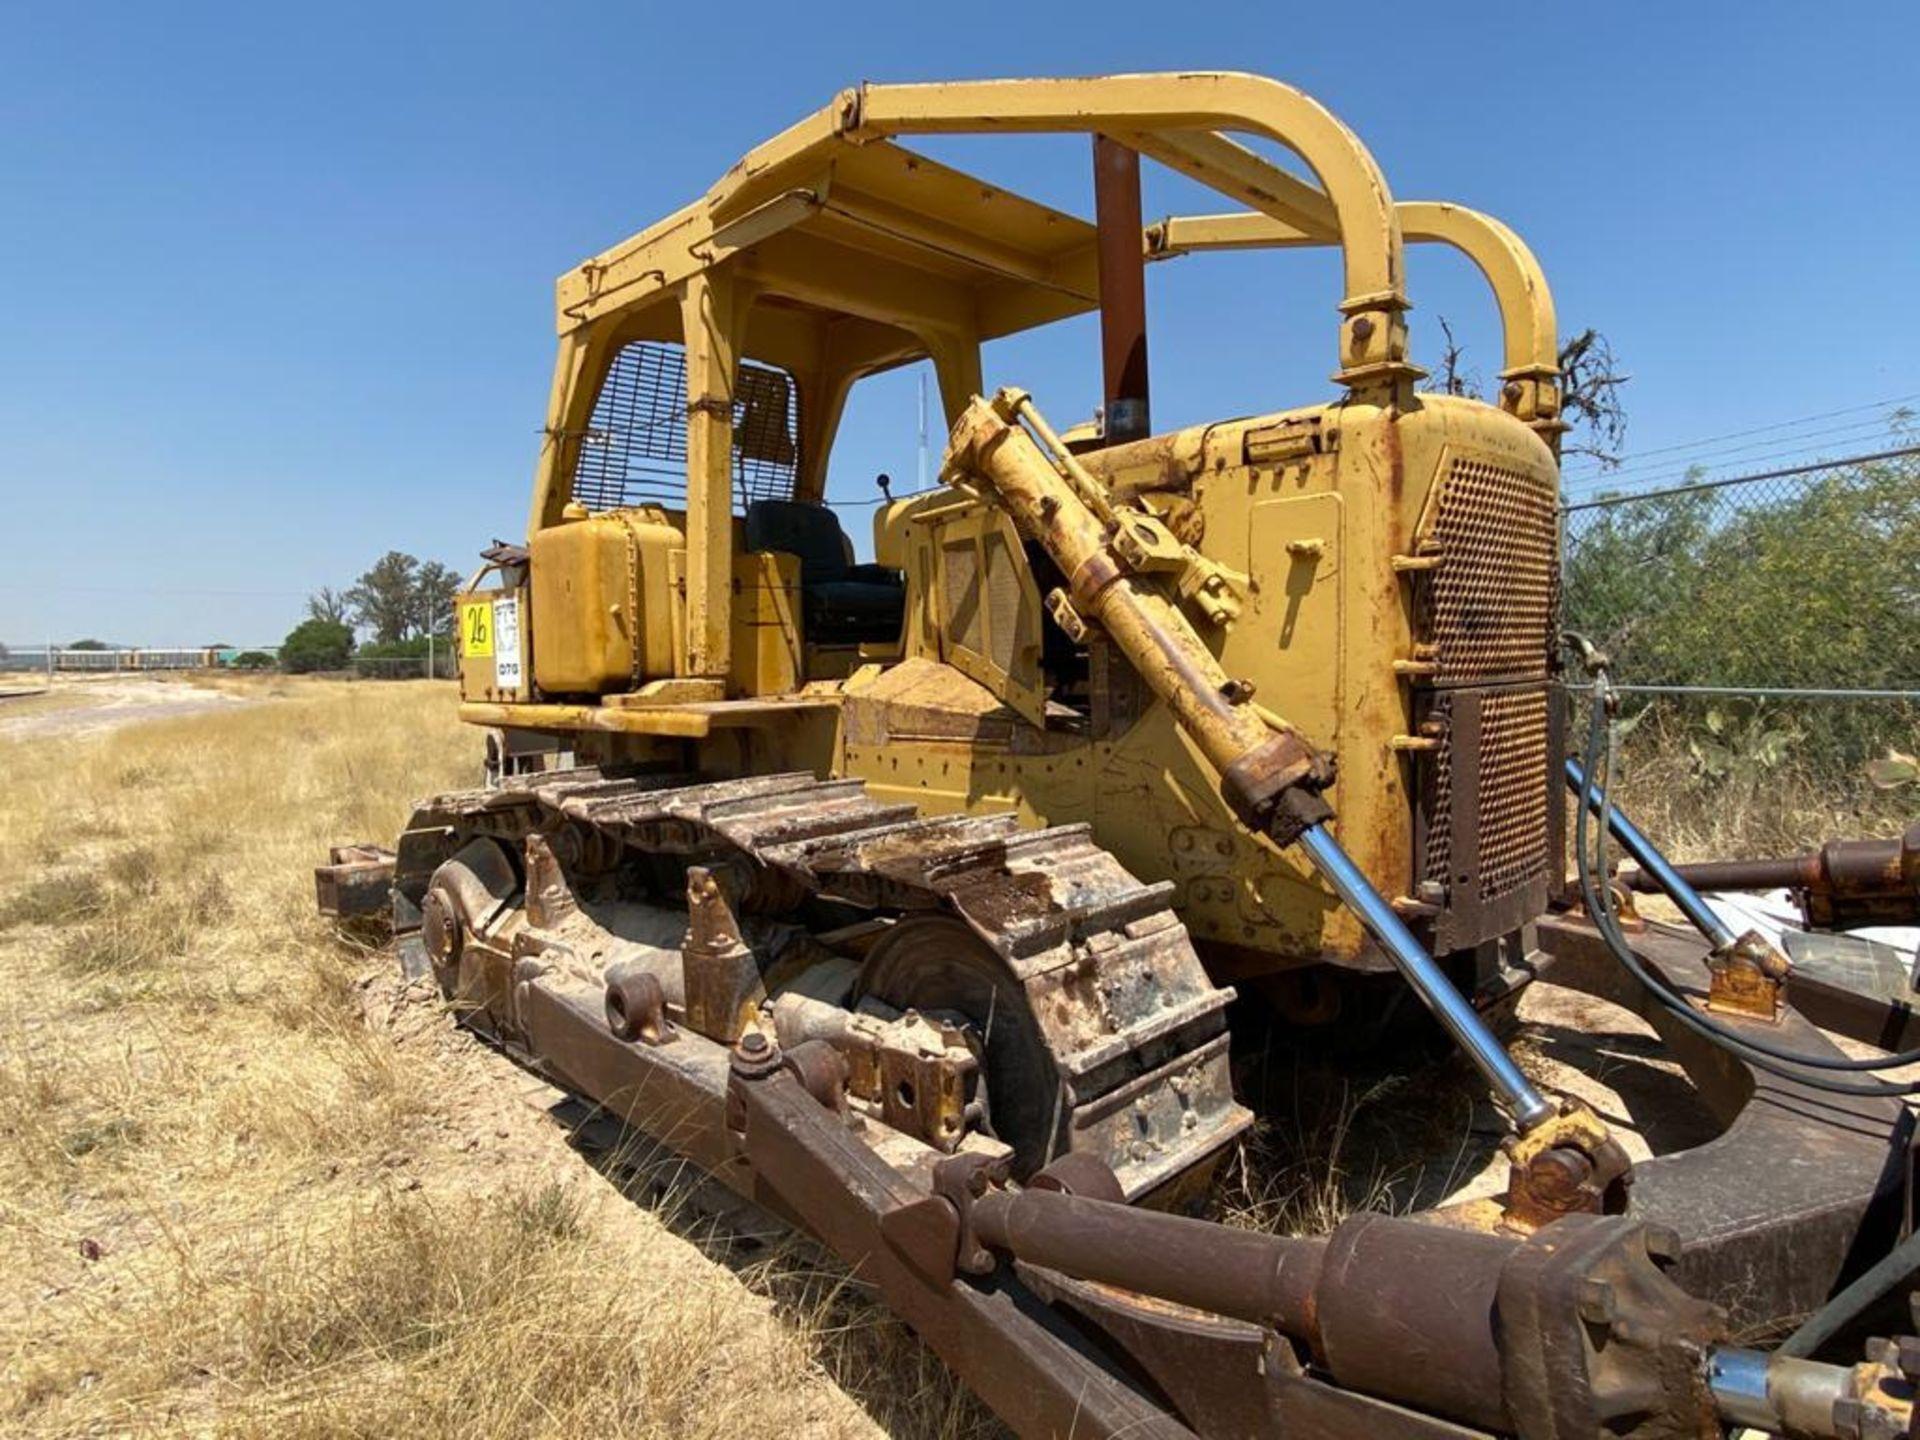 Caterpillar D7G Bulldozer, Serial number 92V5897, Diesel motor - Image 17 of 48